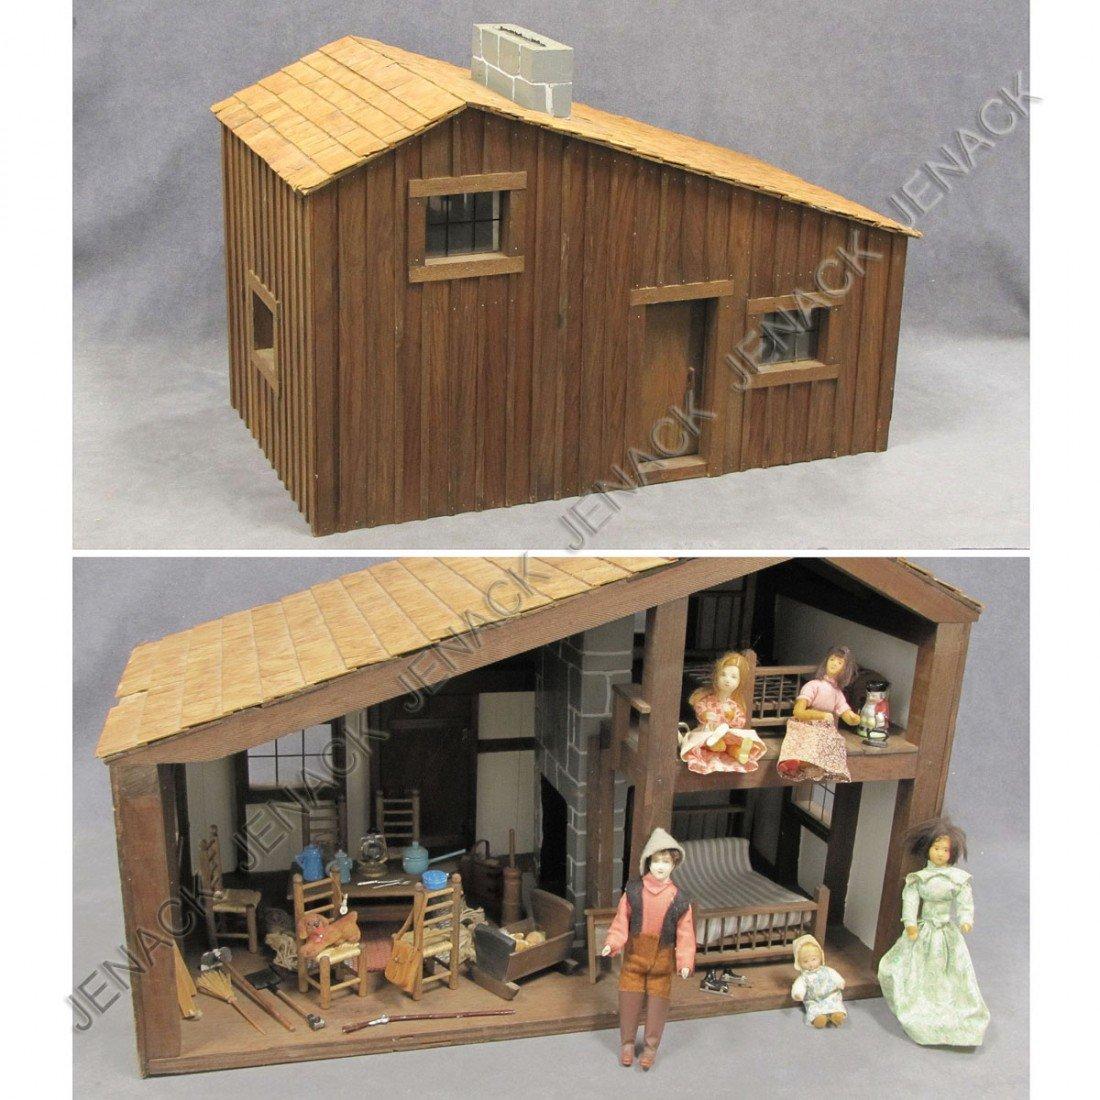 3: VINTAGE RUSTIC CABIN DOLL HOUSE & FURNITURE